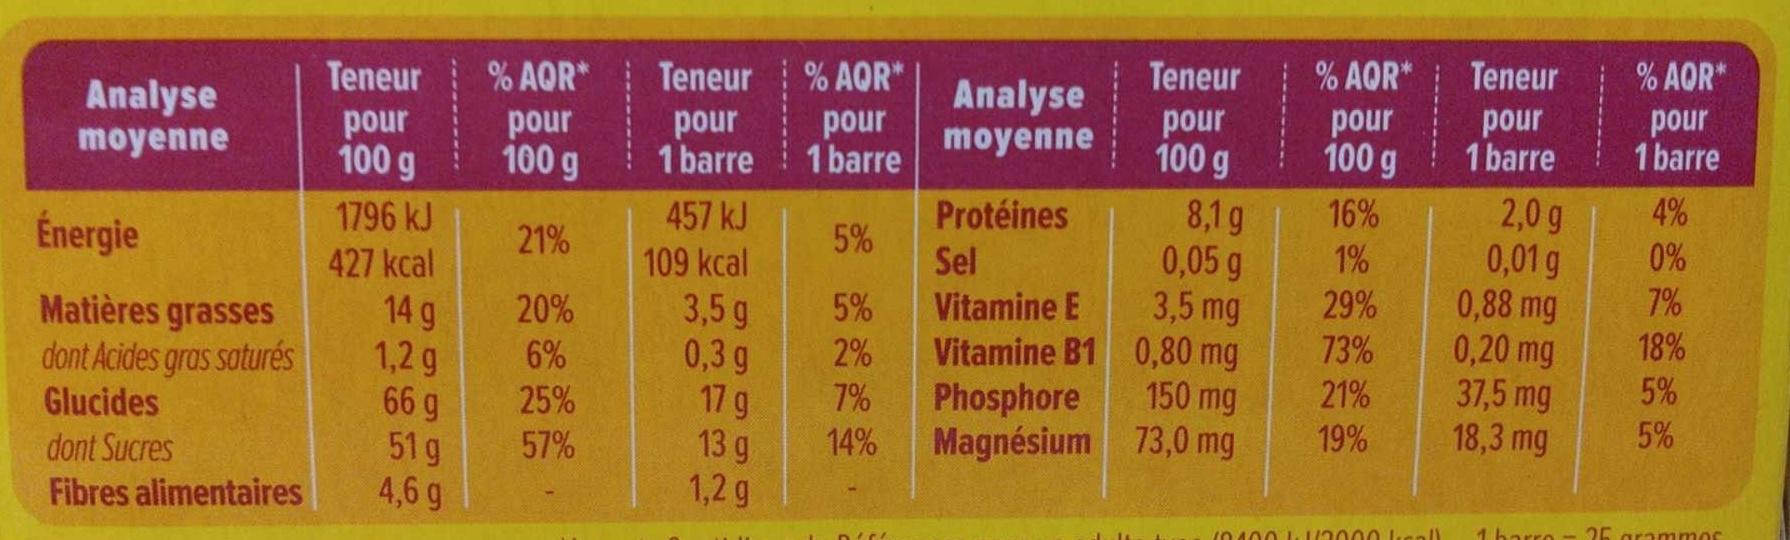 Barre amande Gerblé - Informations nutritionnelles - fr